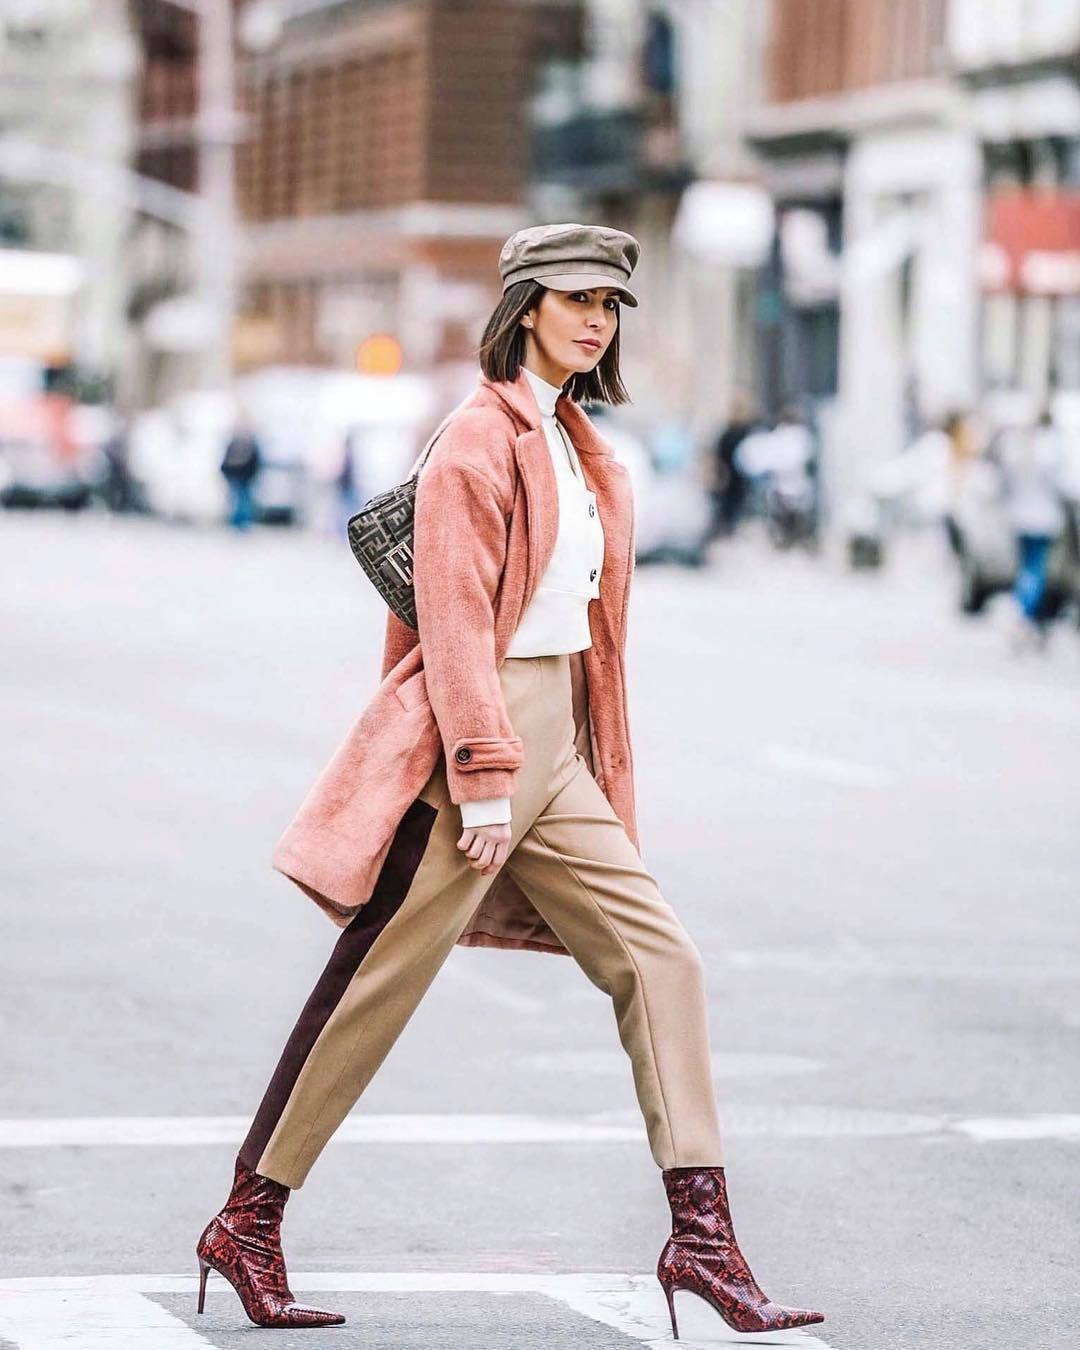 bag shoulder bag fendi red boots snake print ankle boots heel boots high waisted pants pink coat white cardigan white turtleneck top beret